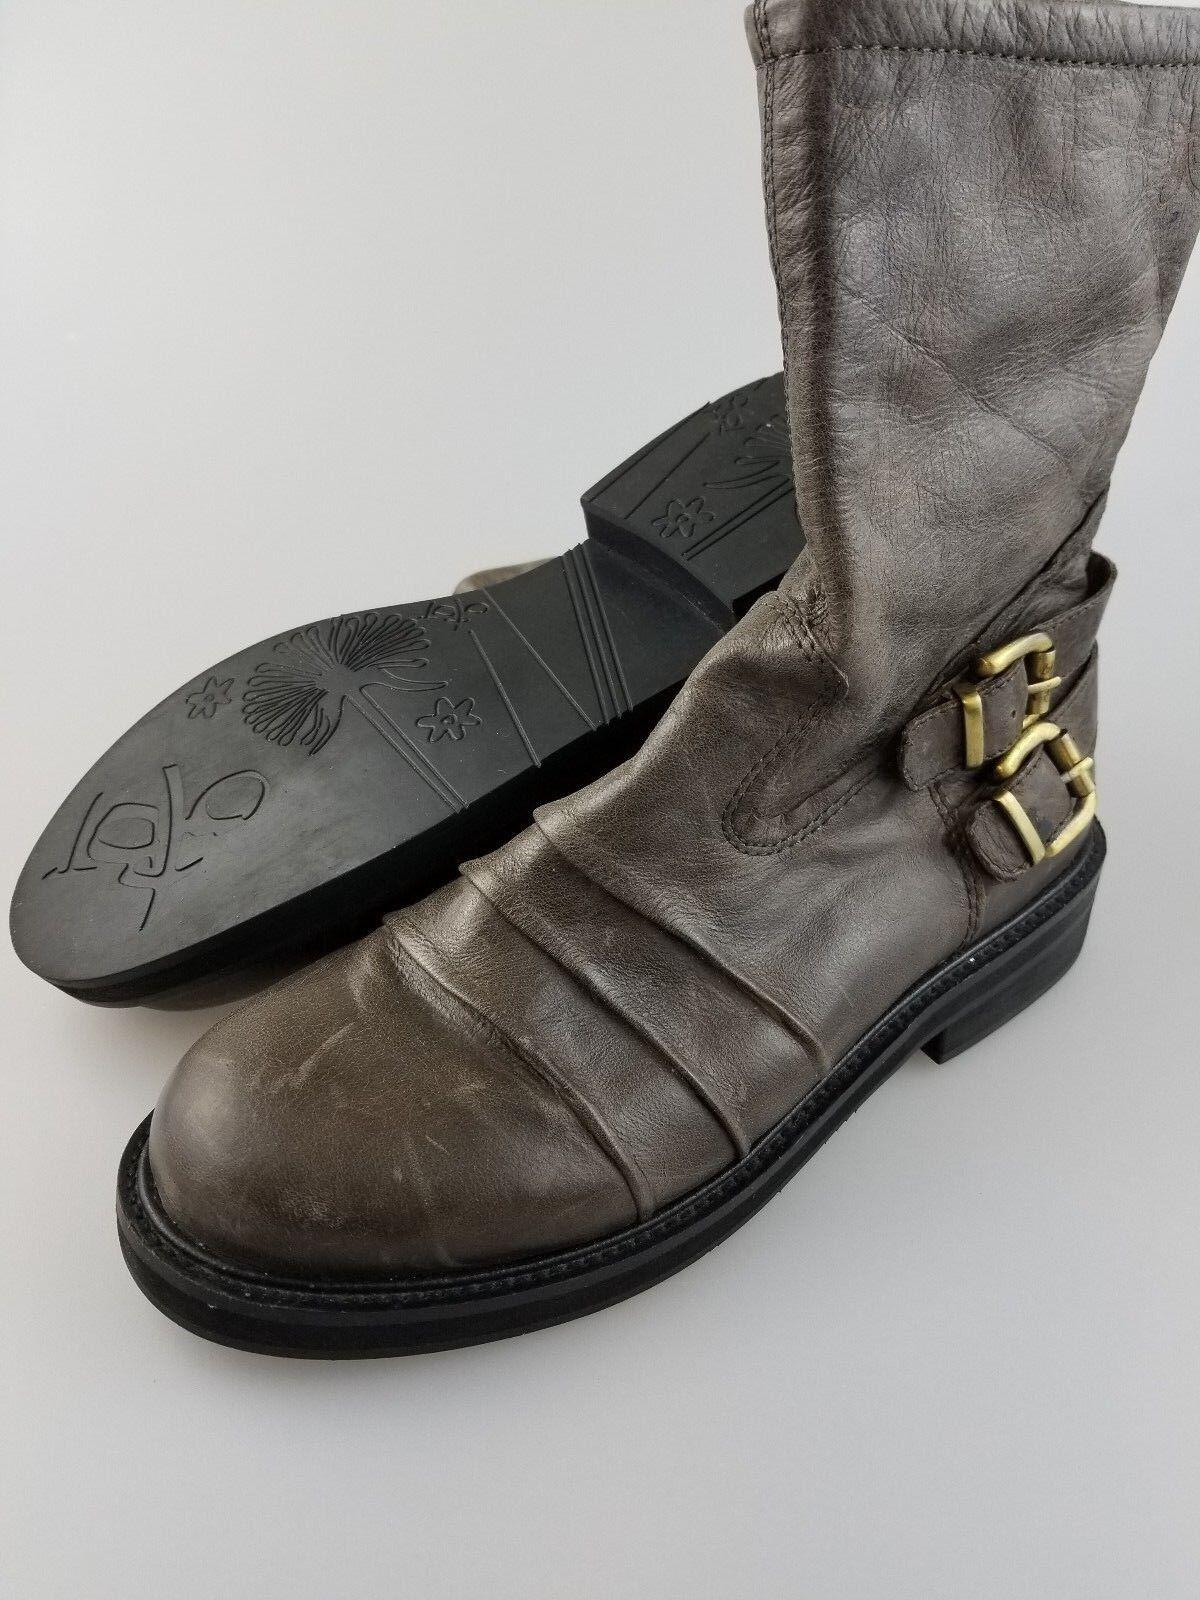 OTBT Appleton Brown Leather Zip Boots Women's US Size 9 M Medium